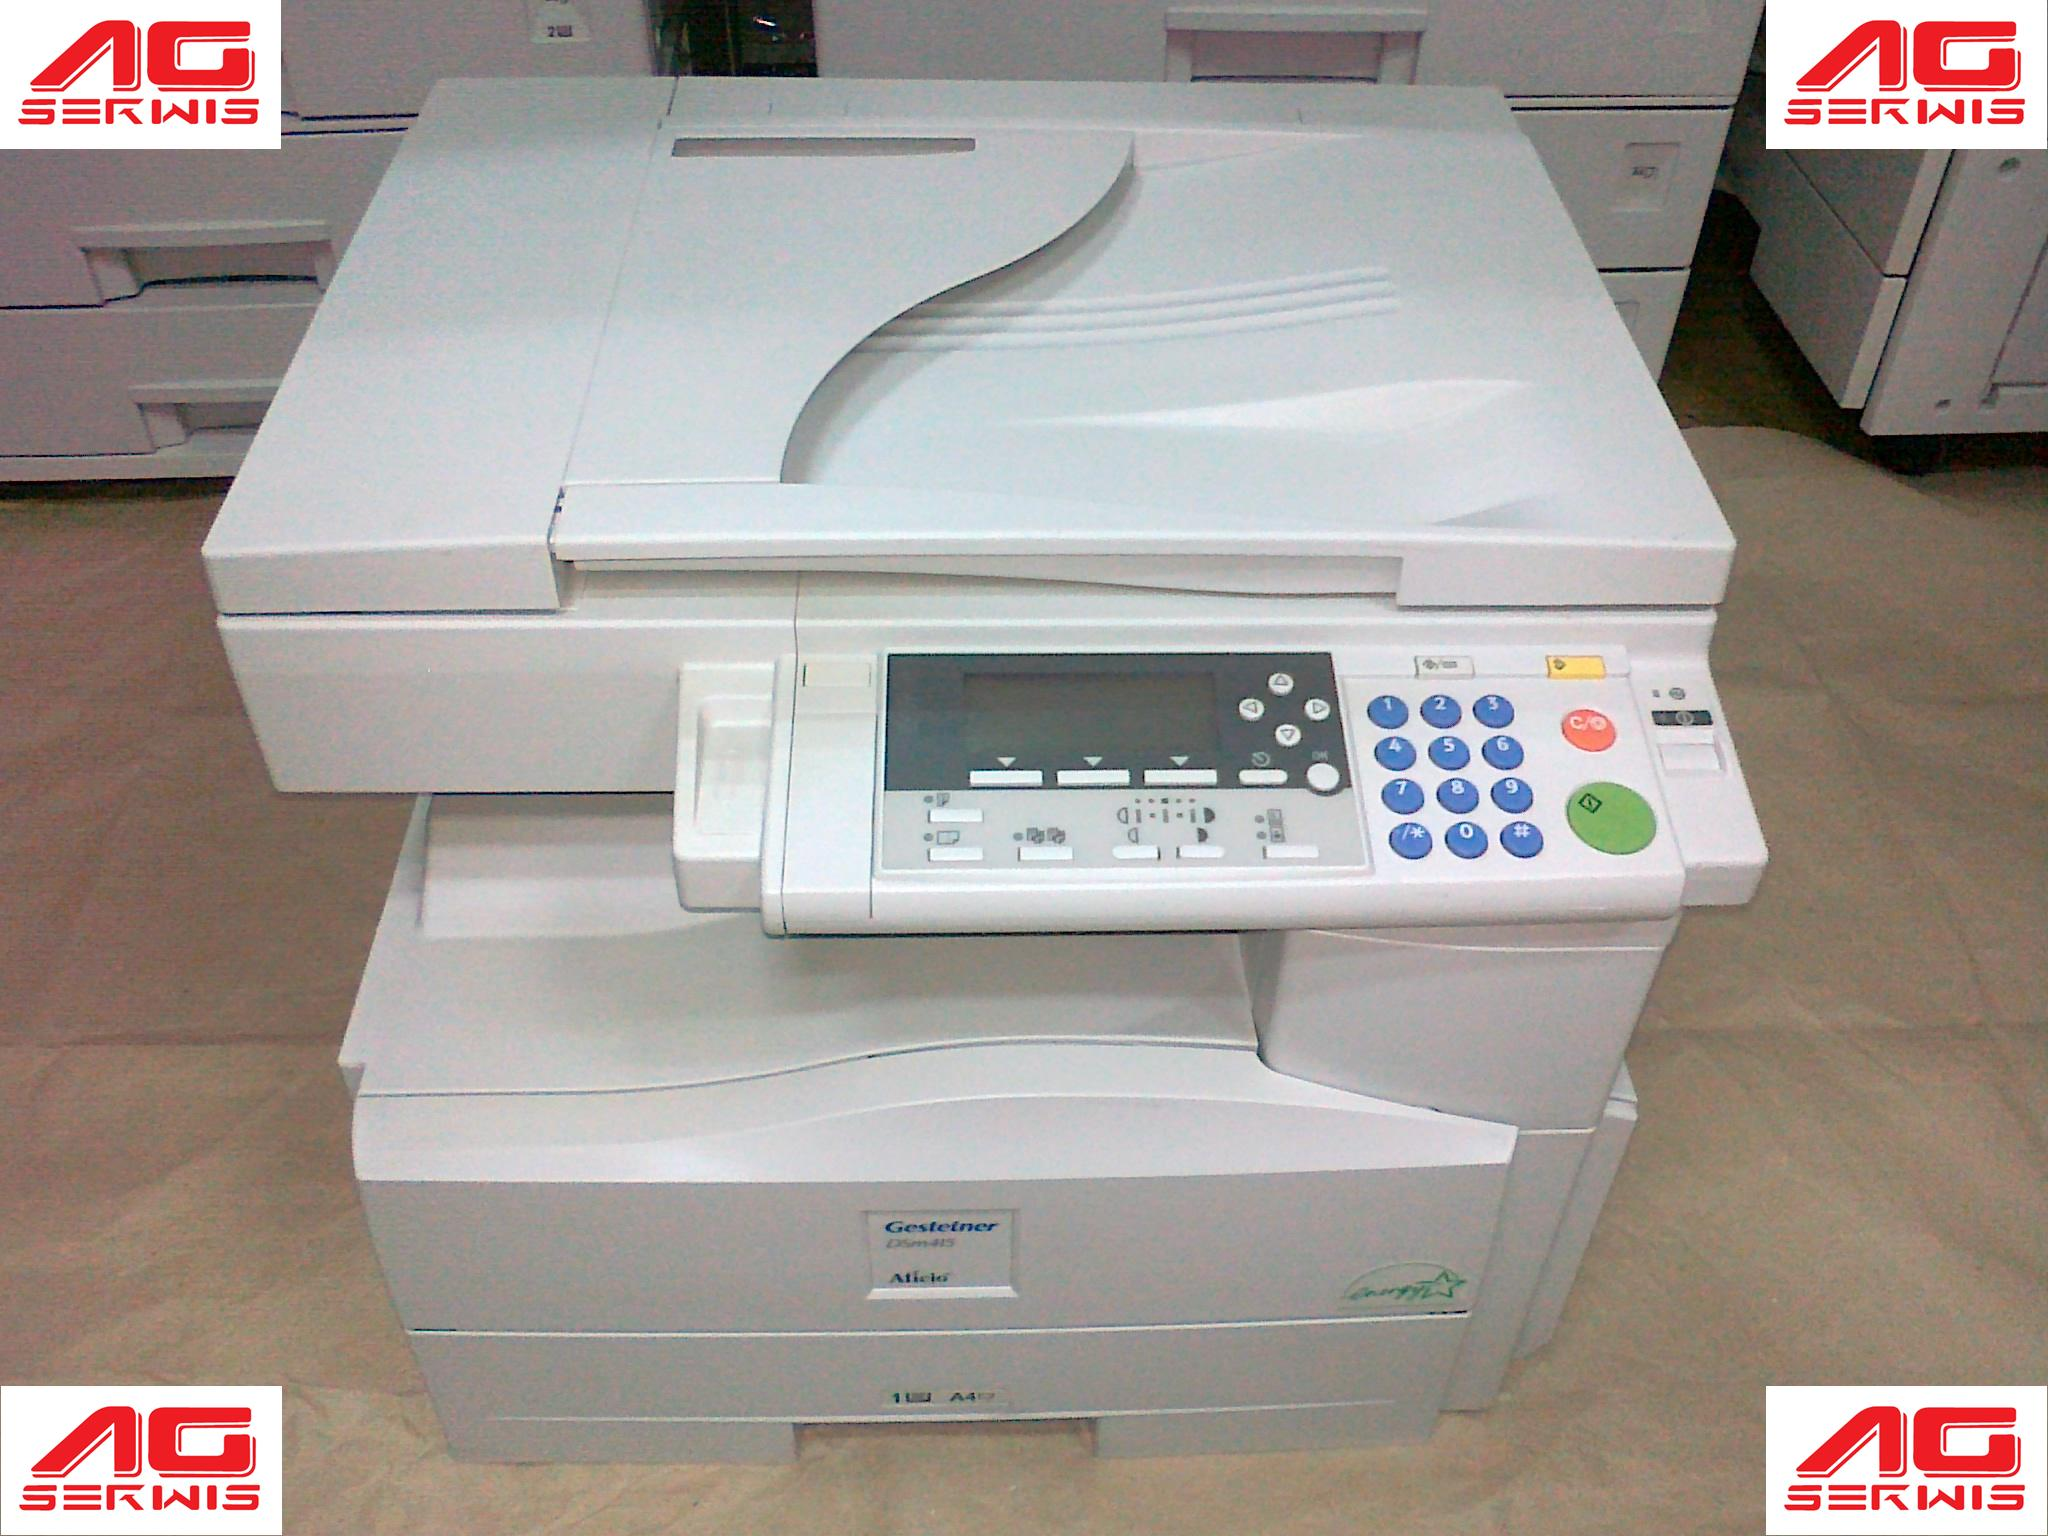 drukarka mala kserokopiarka skaner faks